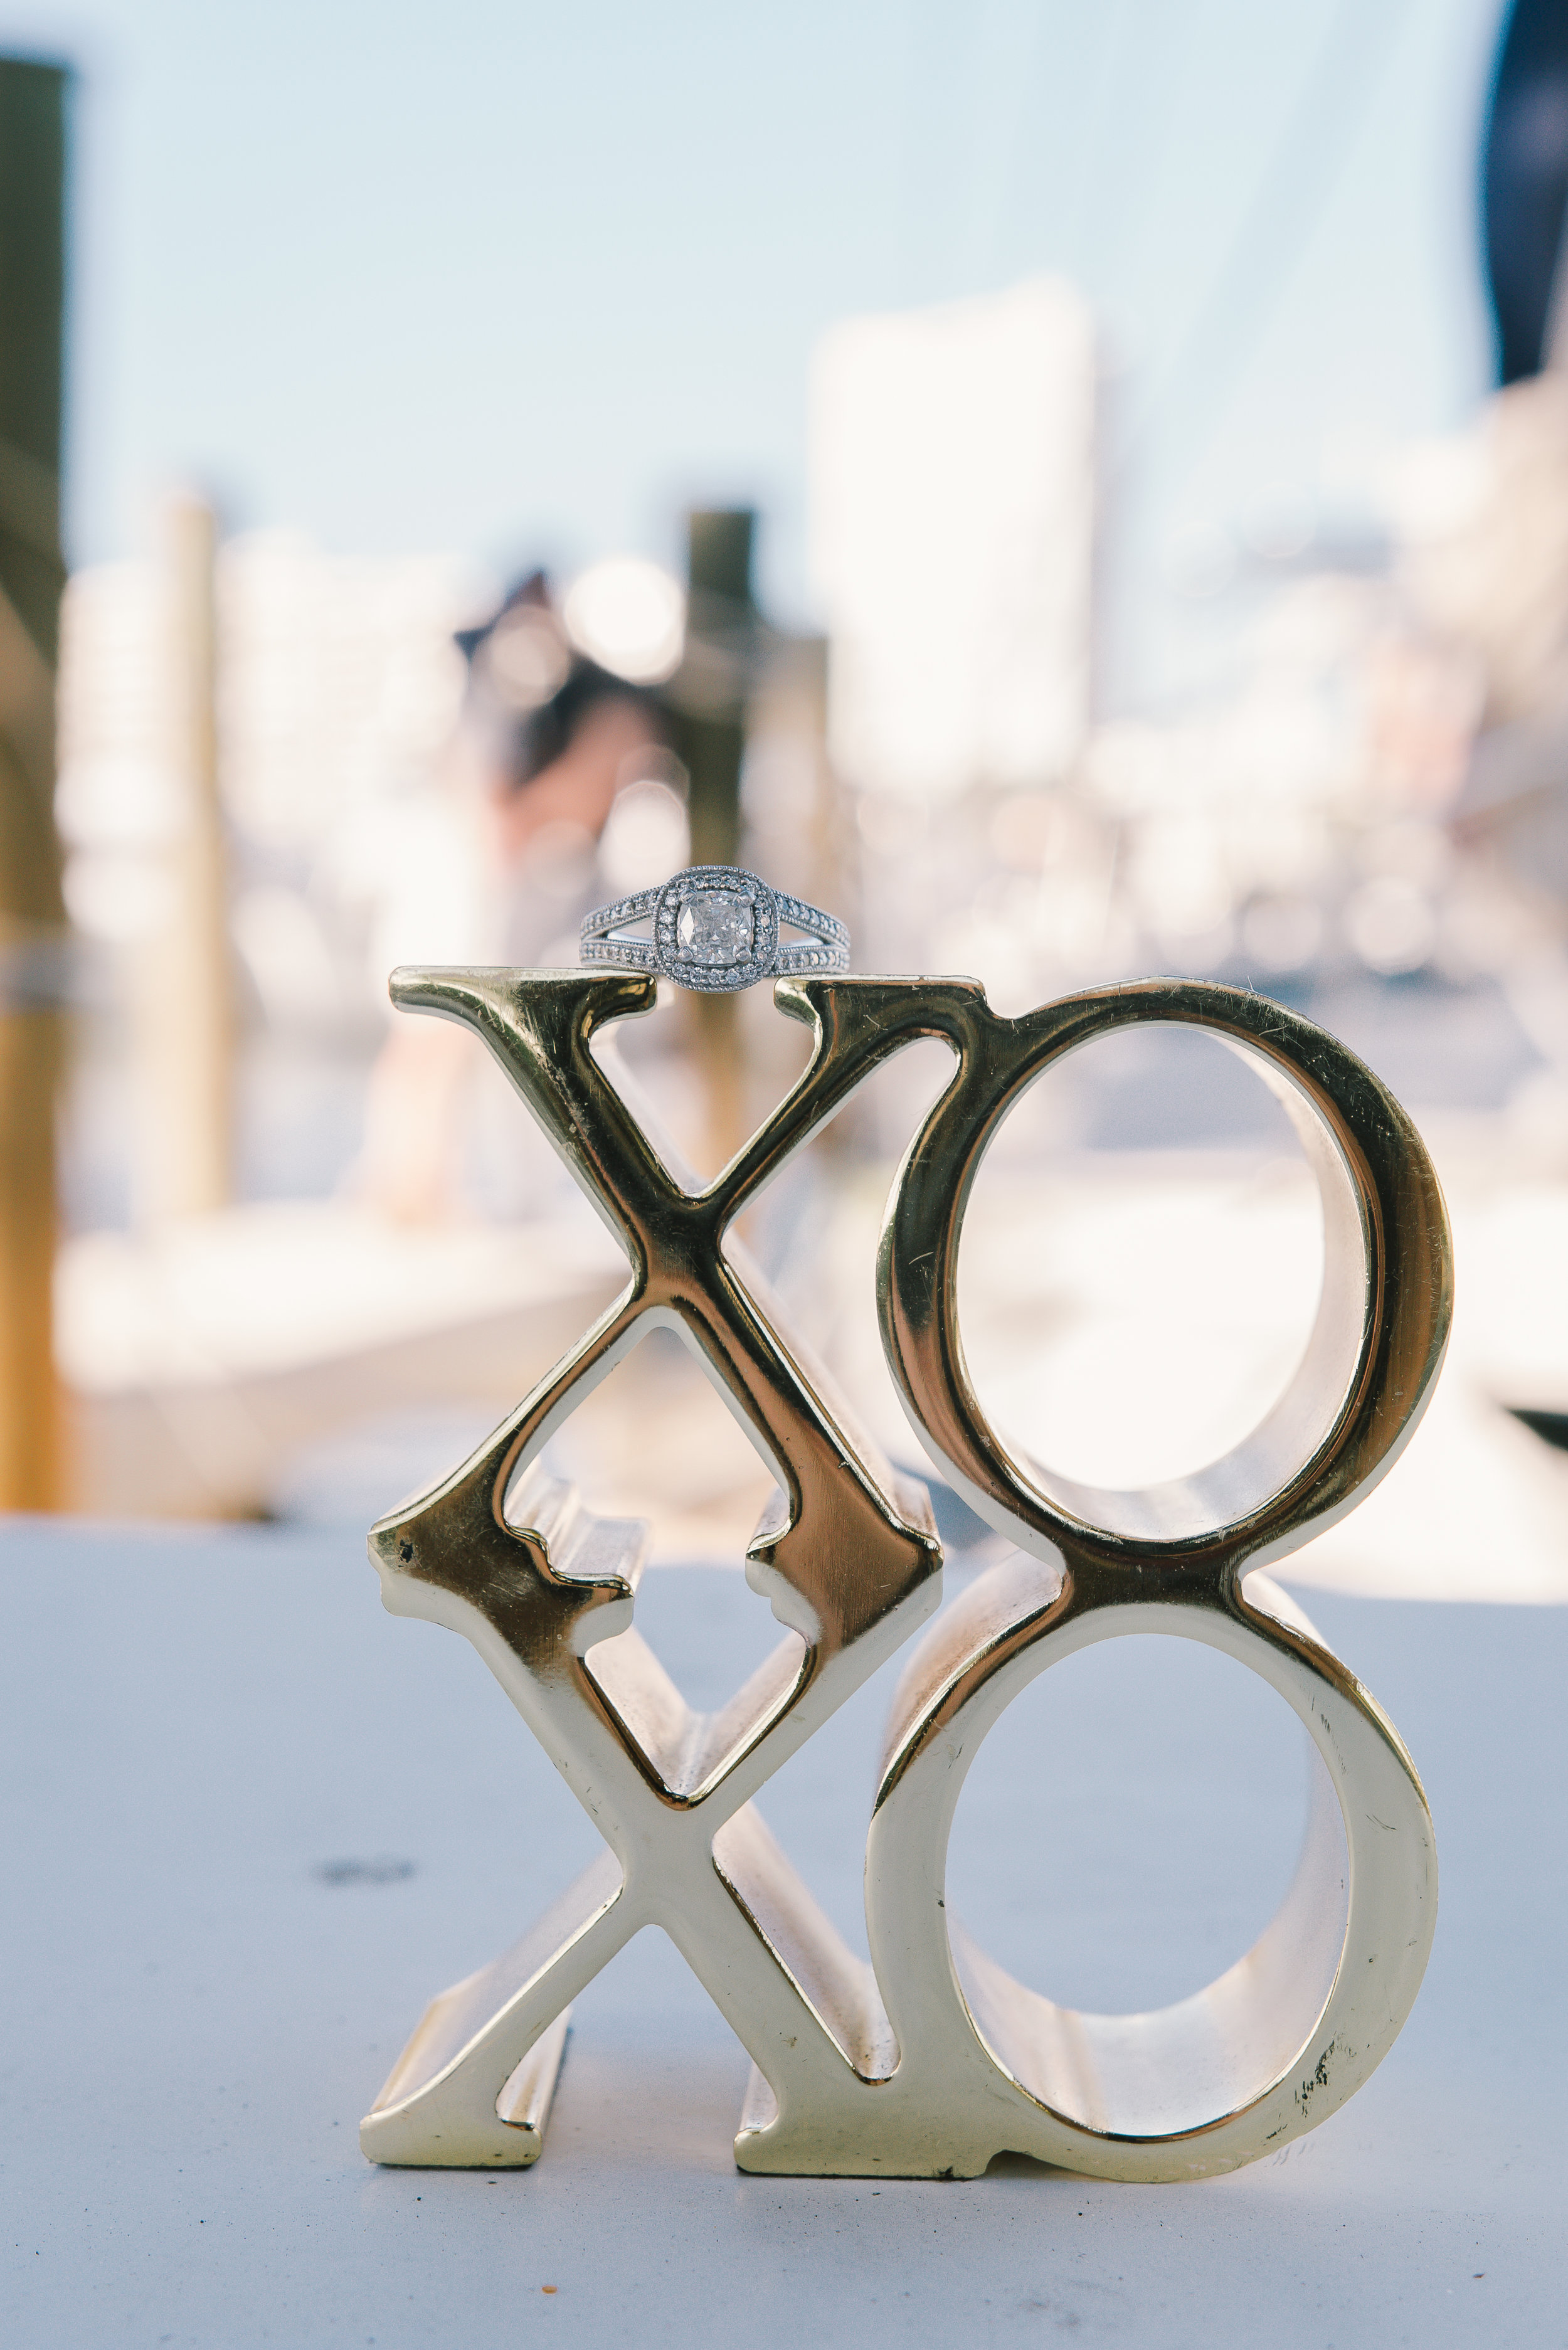 Sarasota-engagement-session, ring-shot